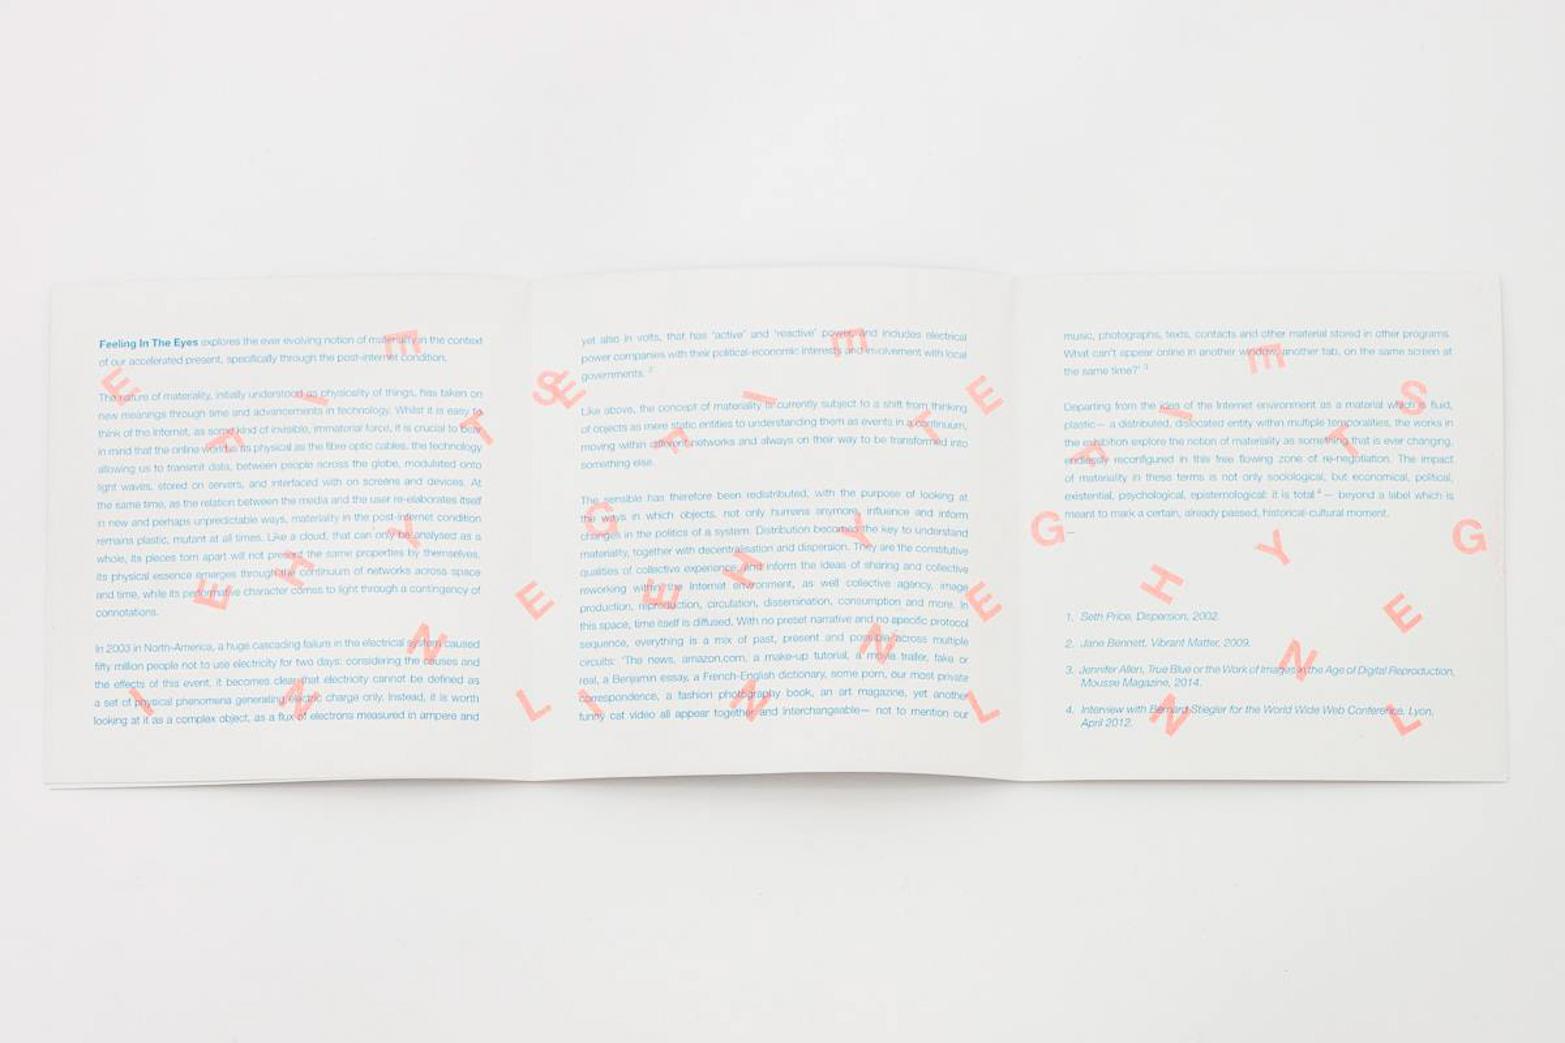 Exhibition handout. Design by Rowena Harris for Tenderpixel.